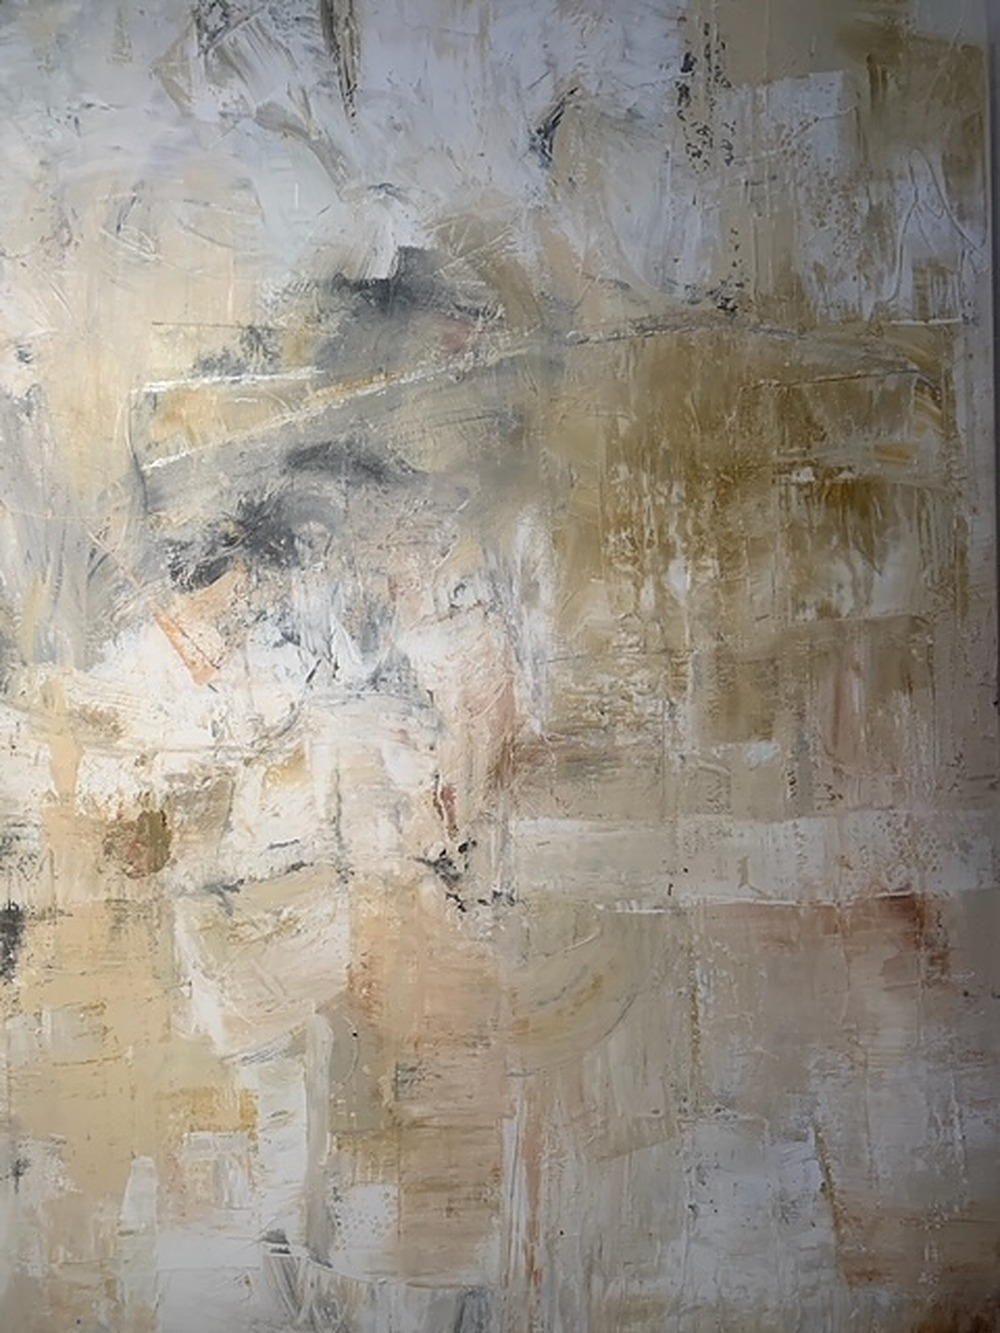 Prairie Ice by Robert Martinez | ArtworkNetwork.com